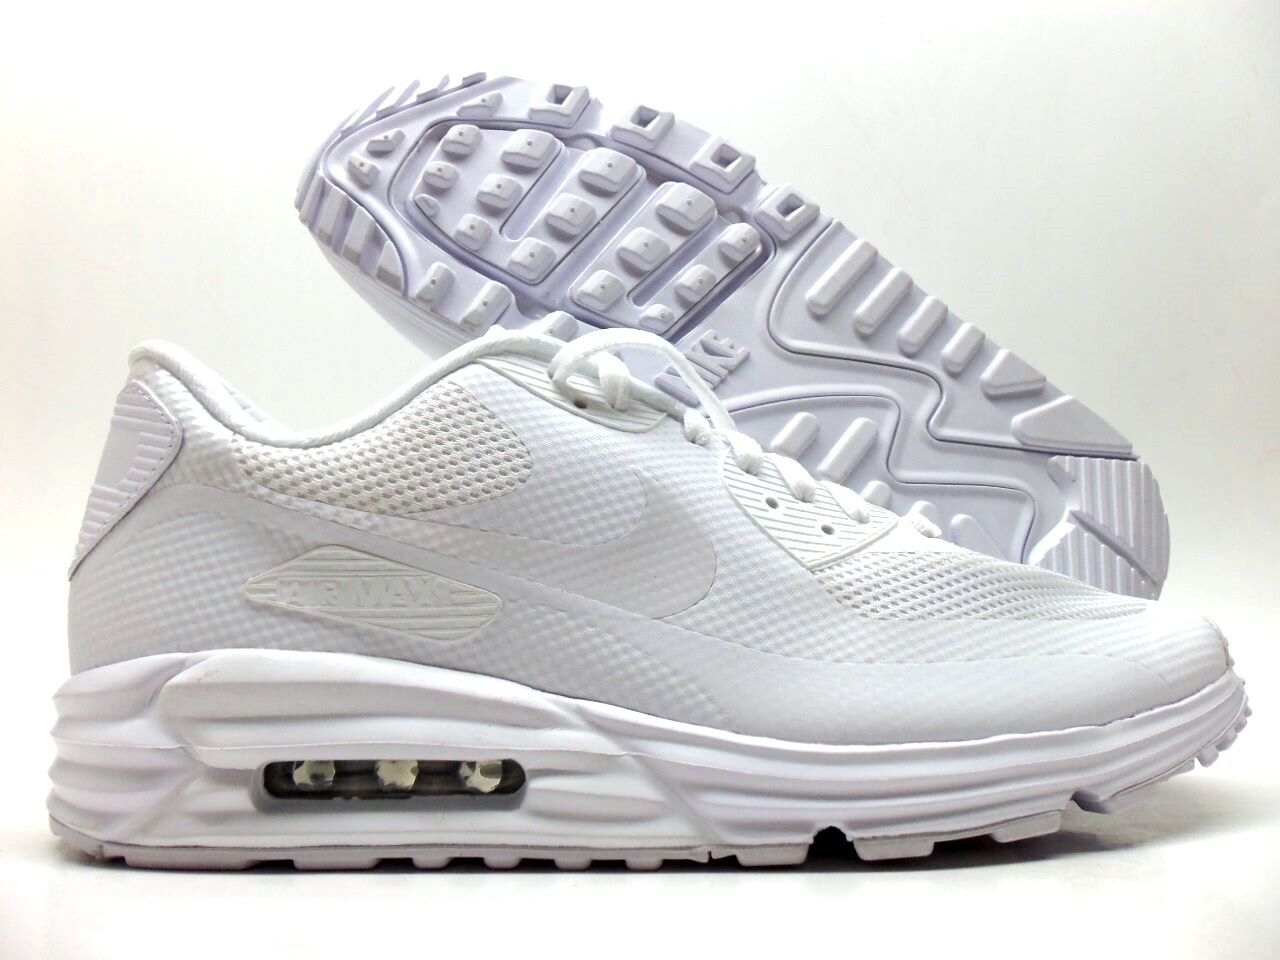 Nike air max 90 lunar hyperfuse premio id white dimensioni uomini 12 [653604-993]